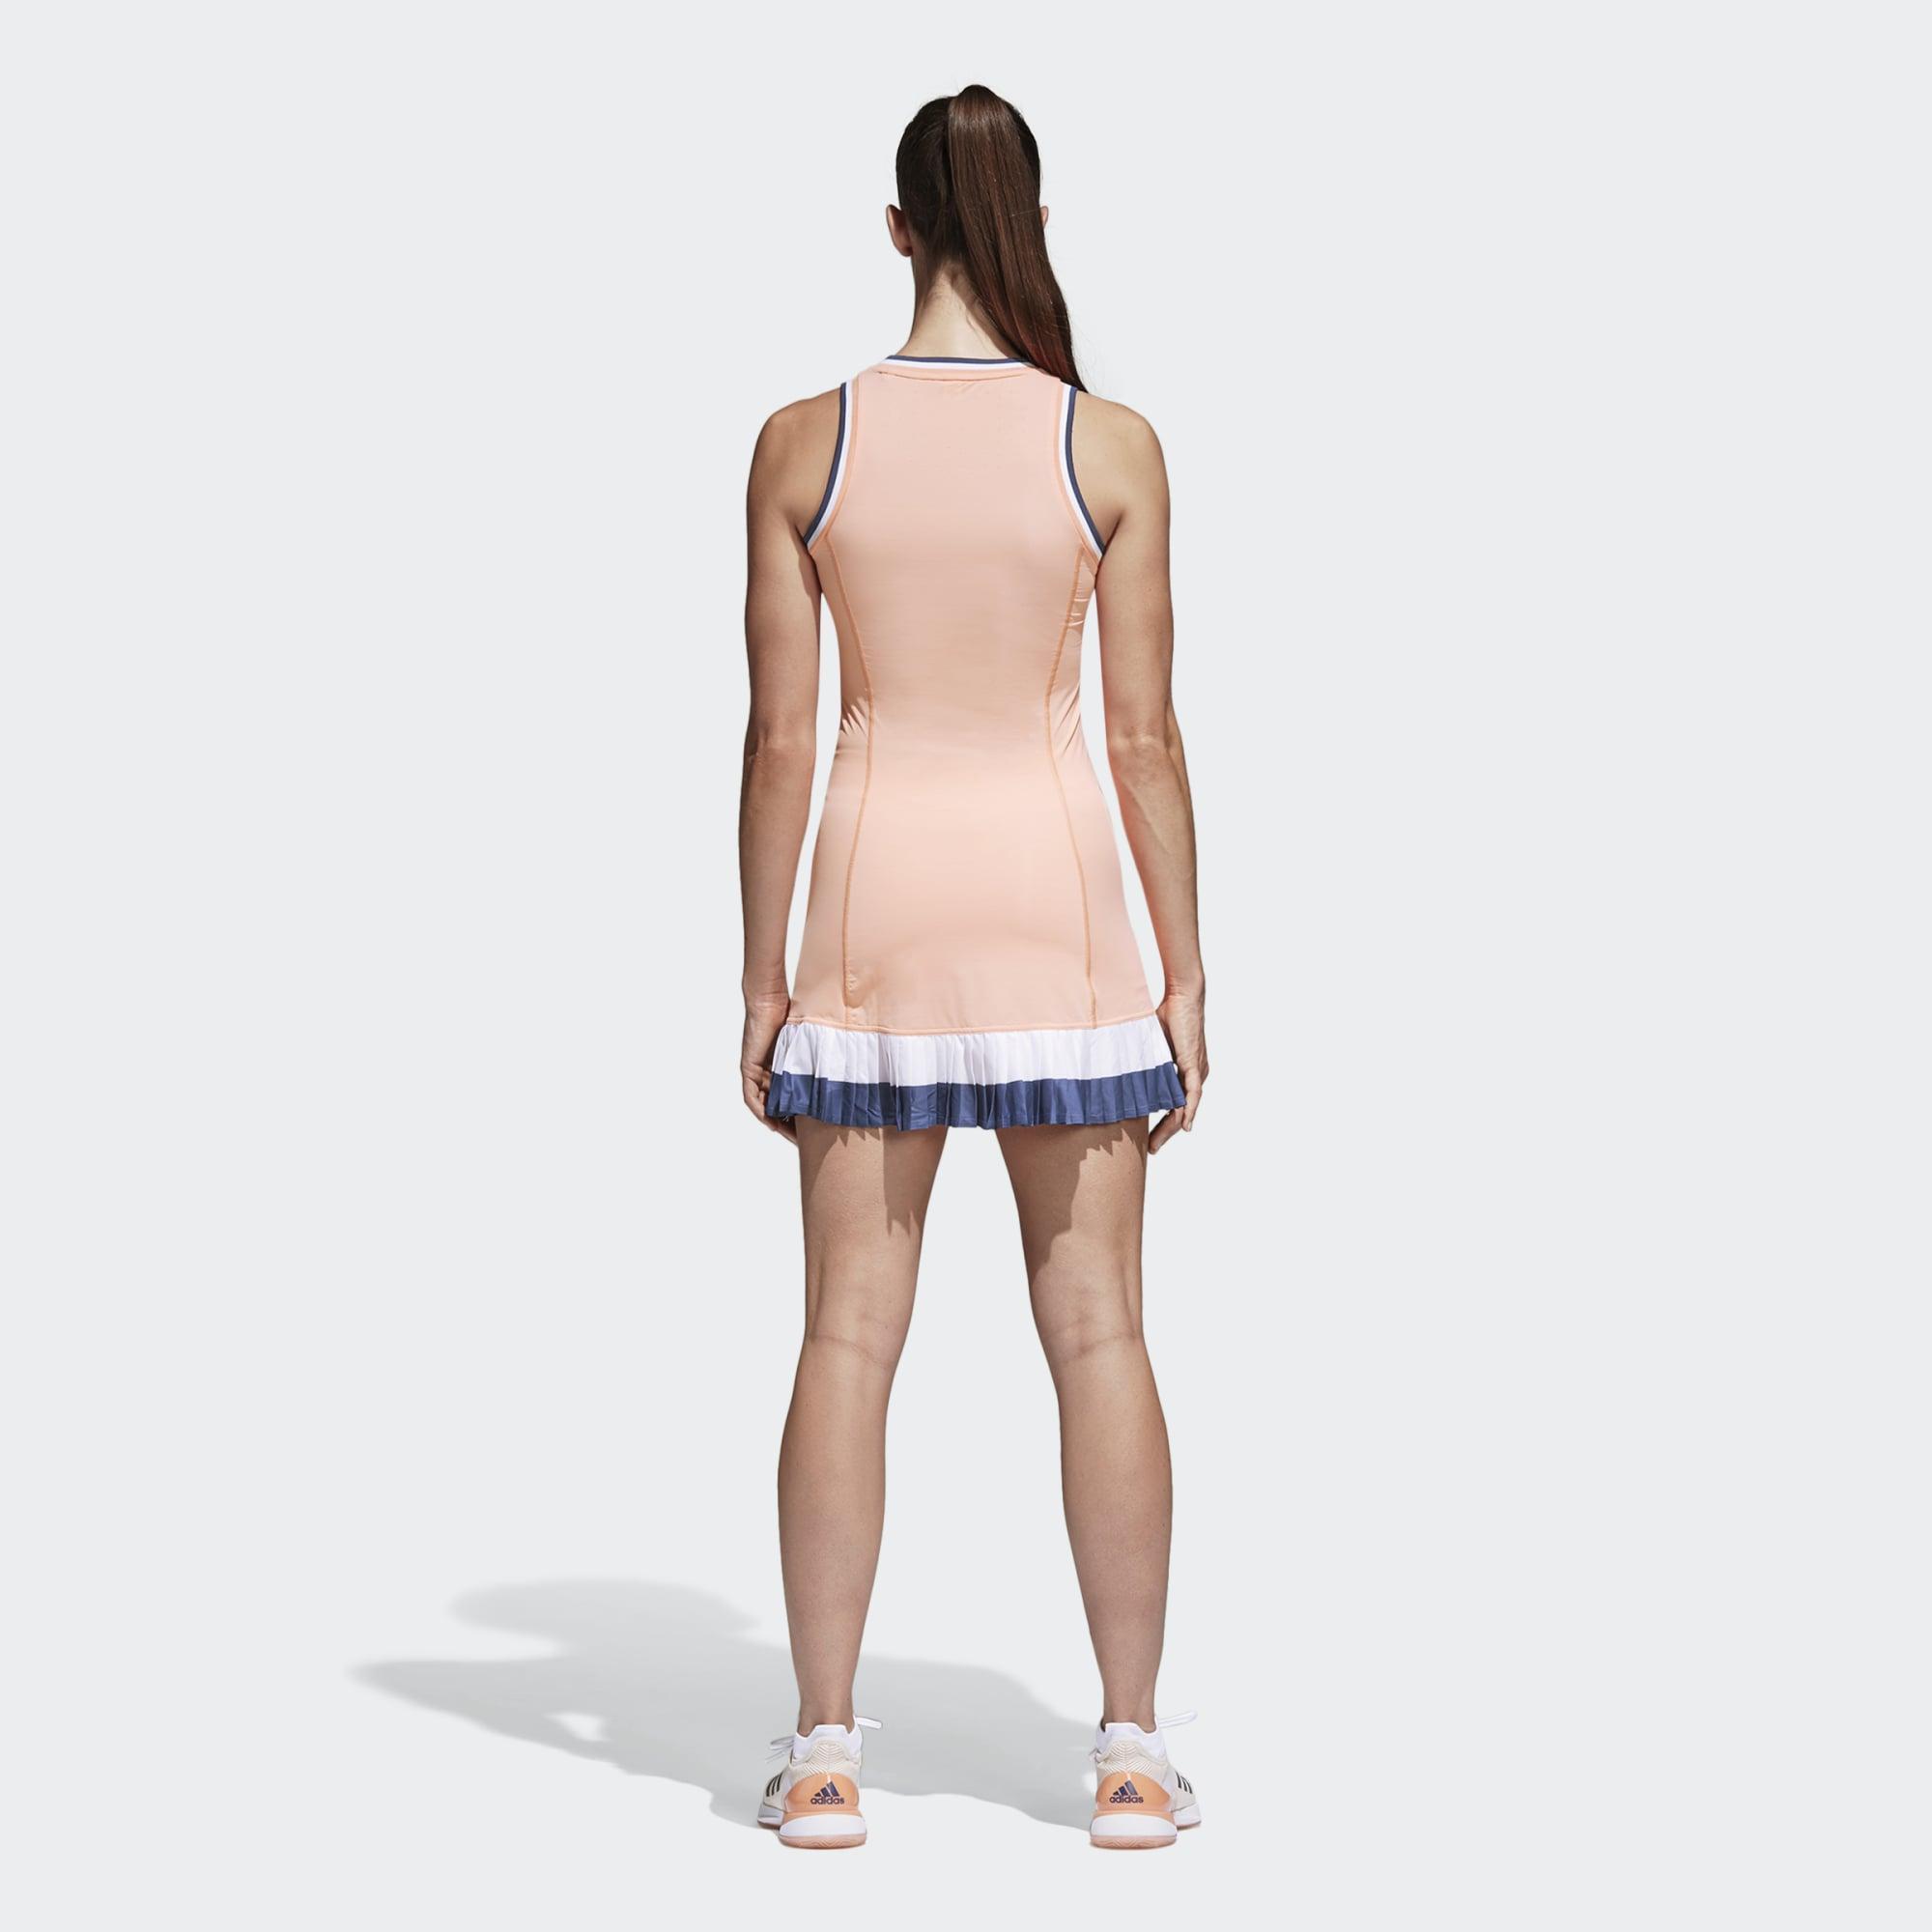 Dressing Gowns For Women: Adidas Womens Roland Garros Dress